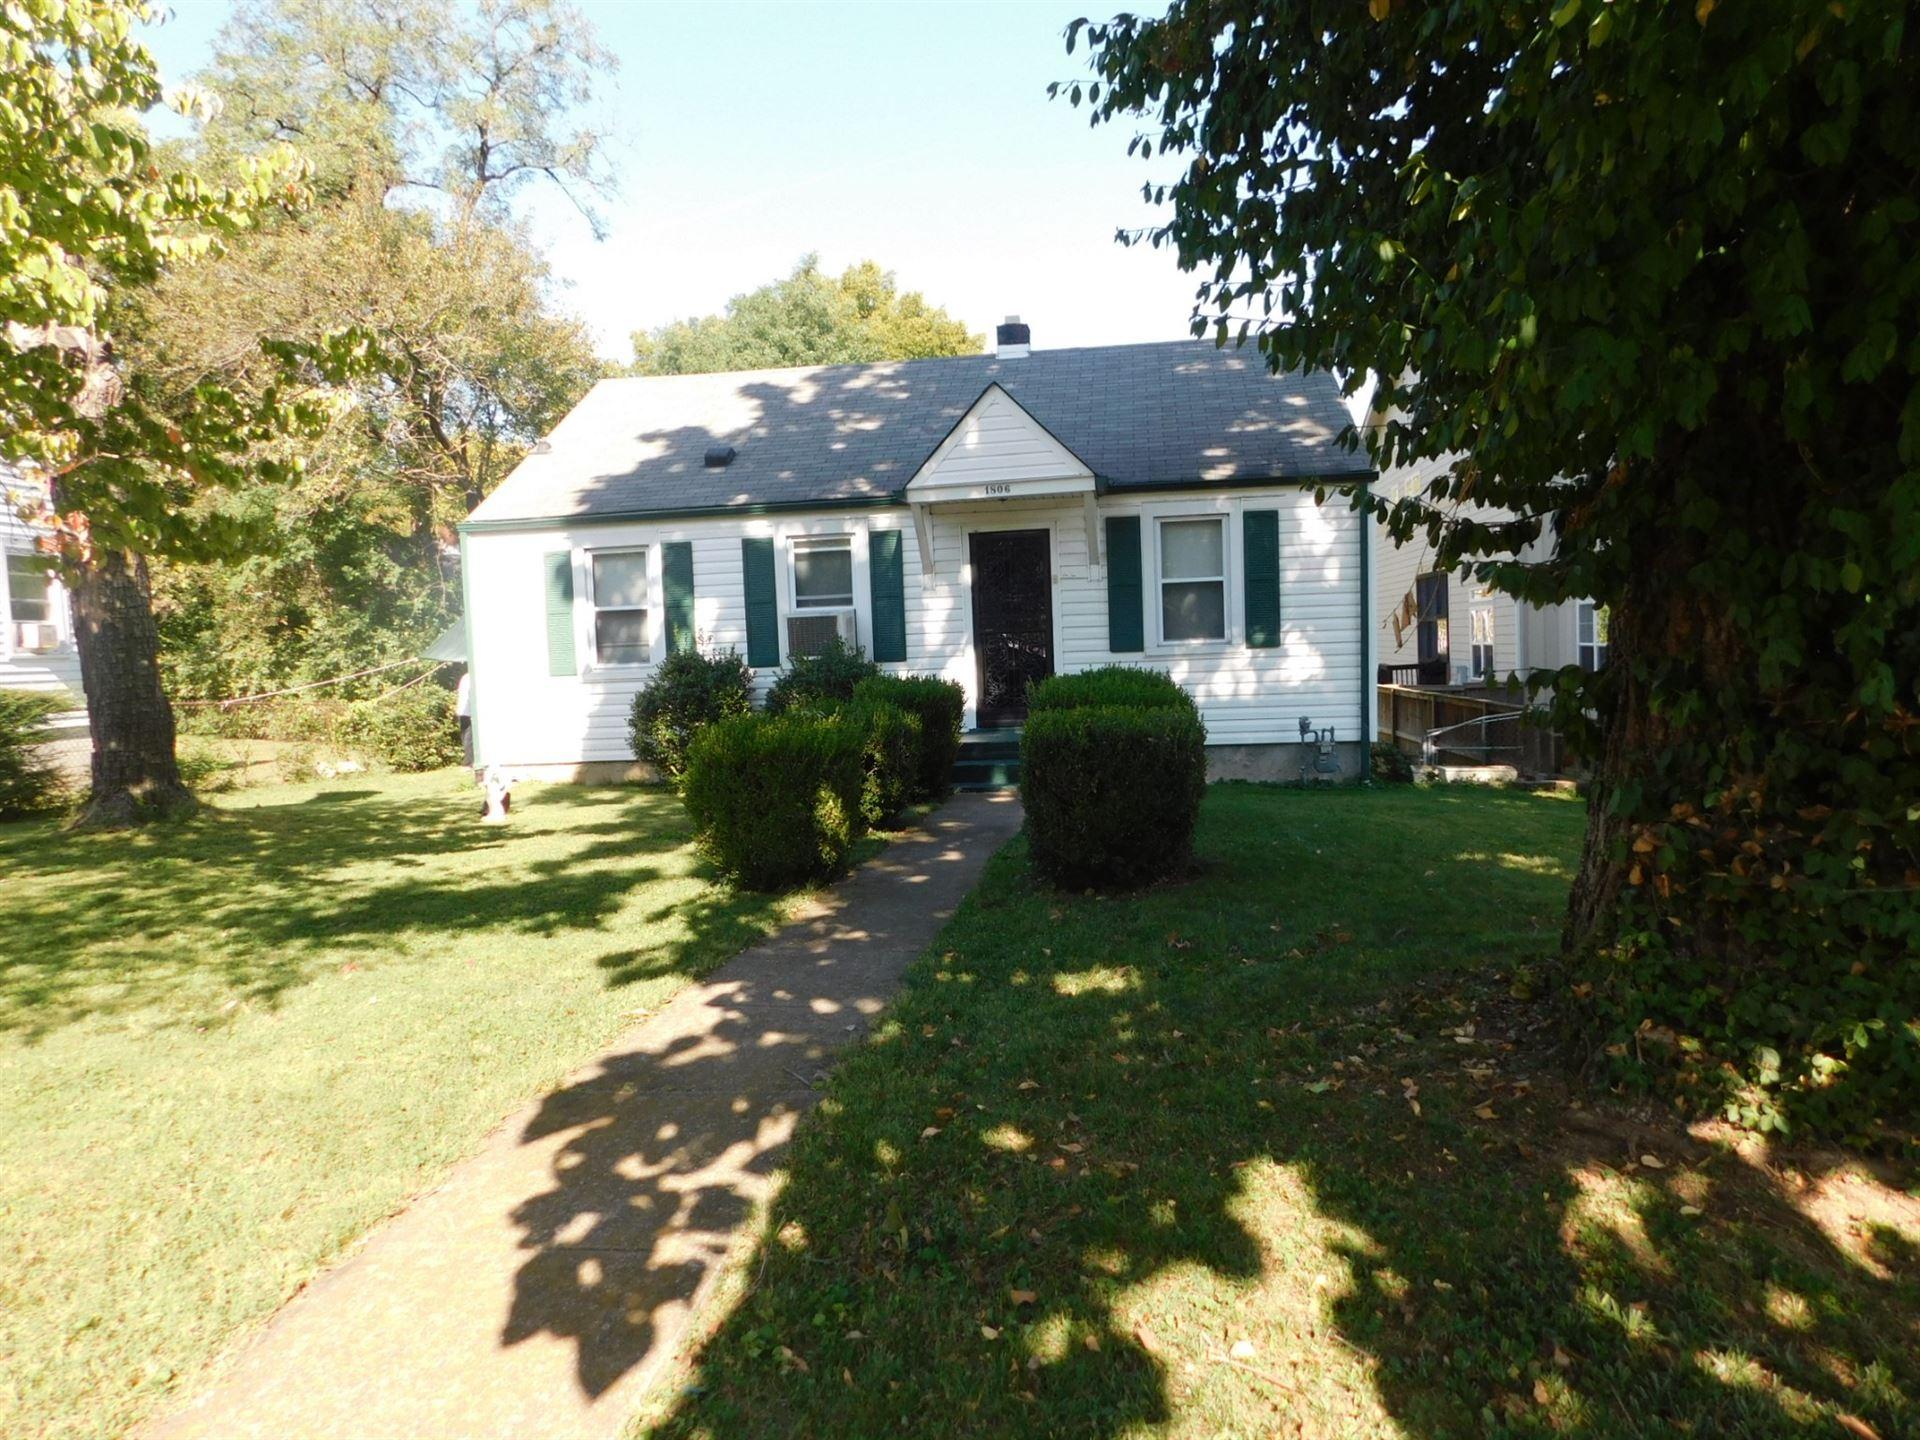 1806 Elliott Ave, Nashville, TN 37203 - MLS#: 2196329